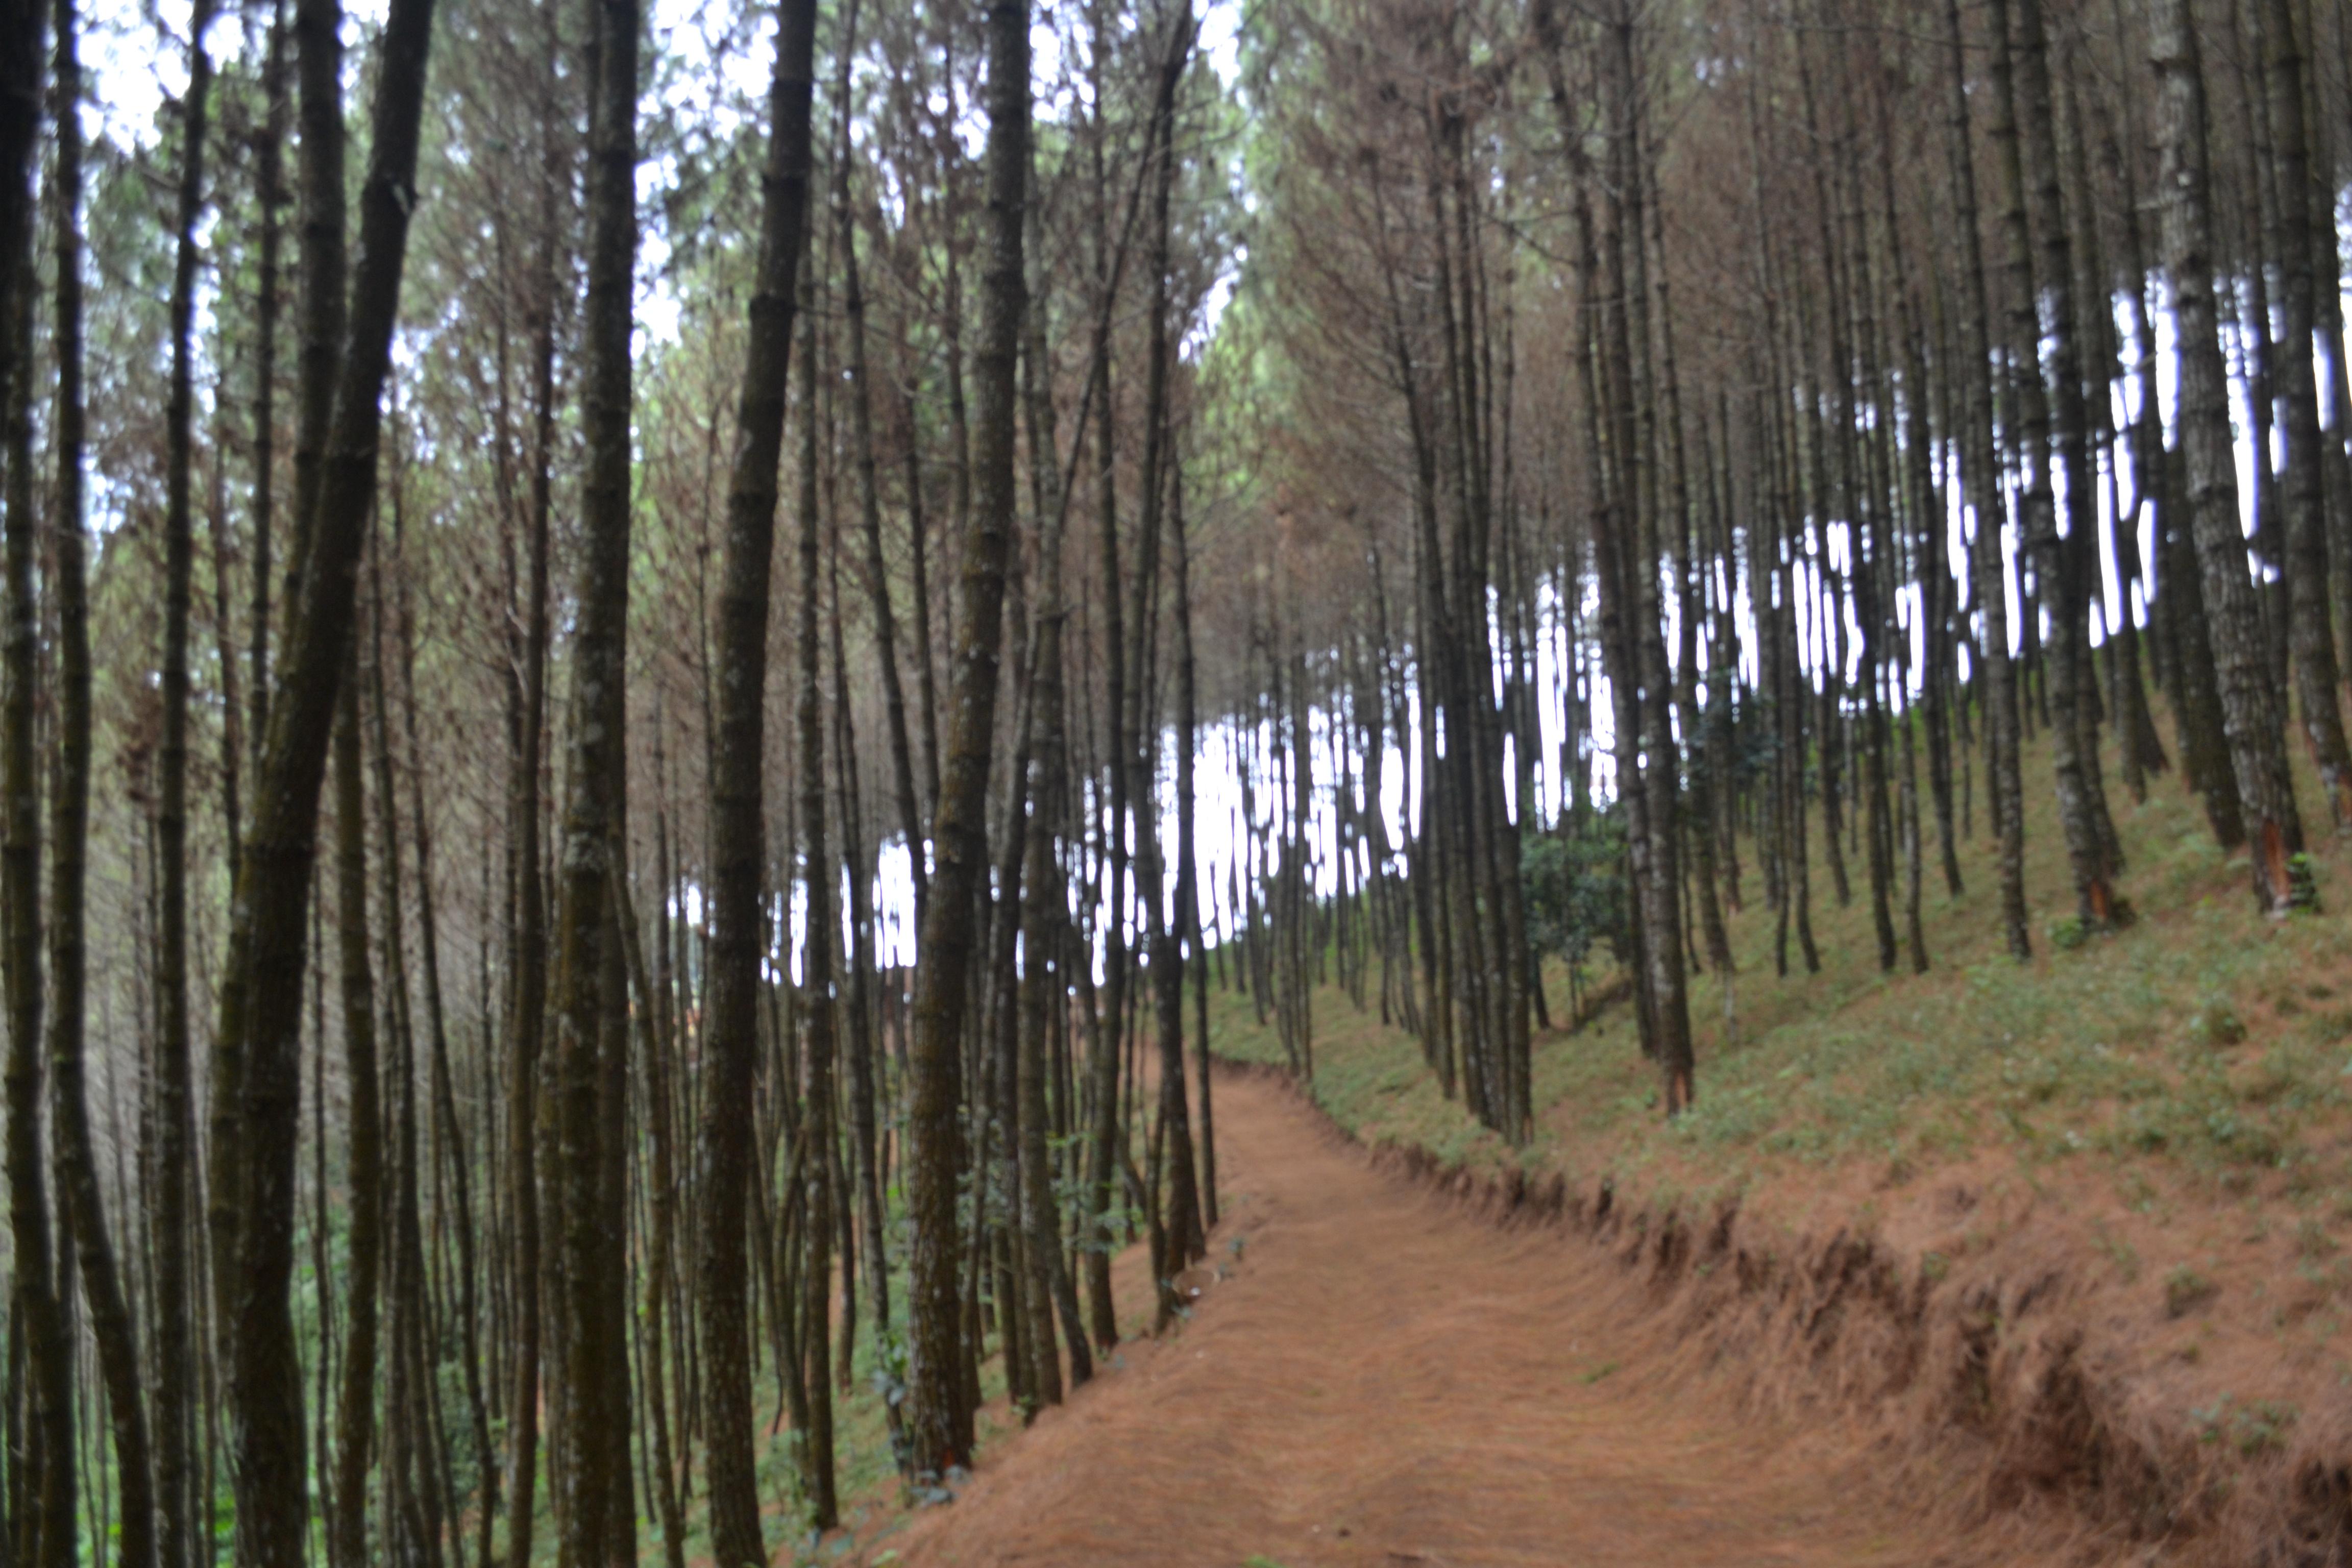 Bukit Moko Puncak Tertinggi Kota Bandung Klikhotel Hutan Pinus Menuju